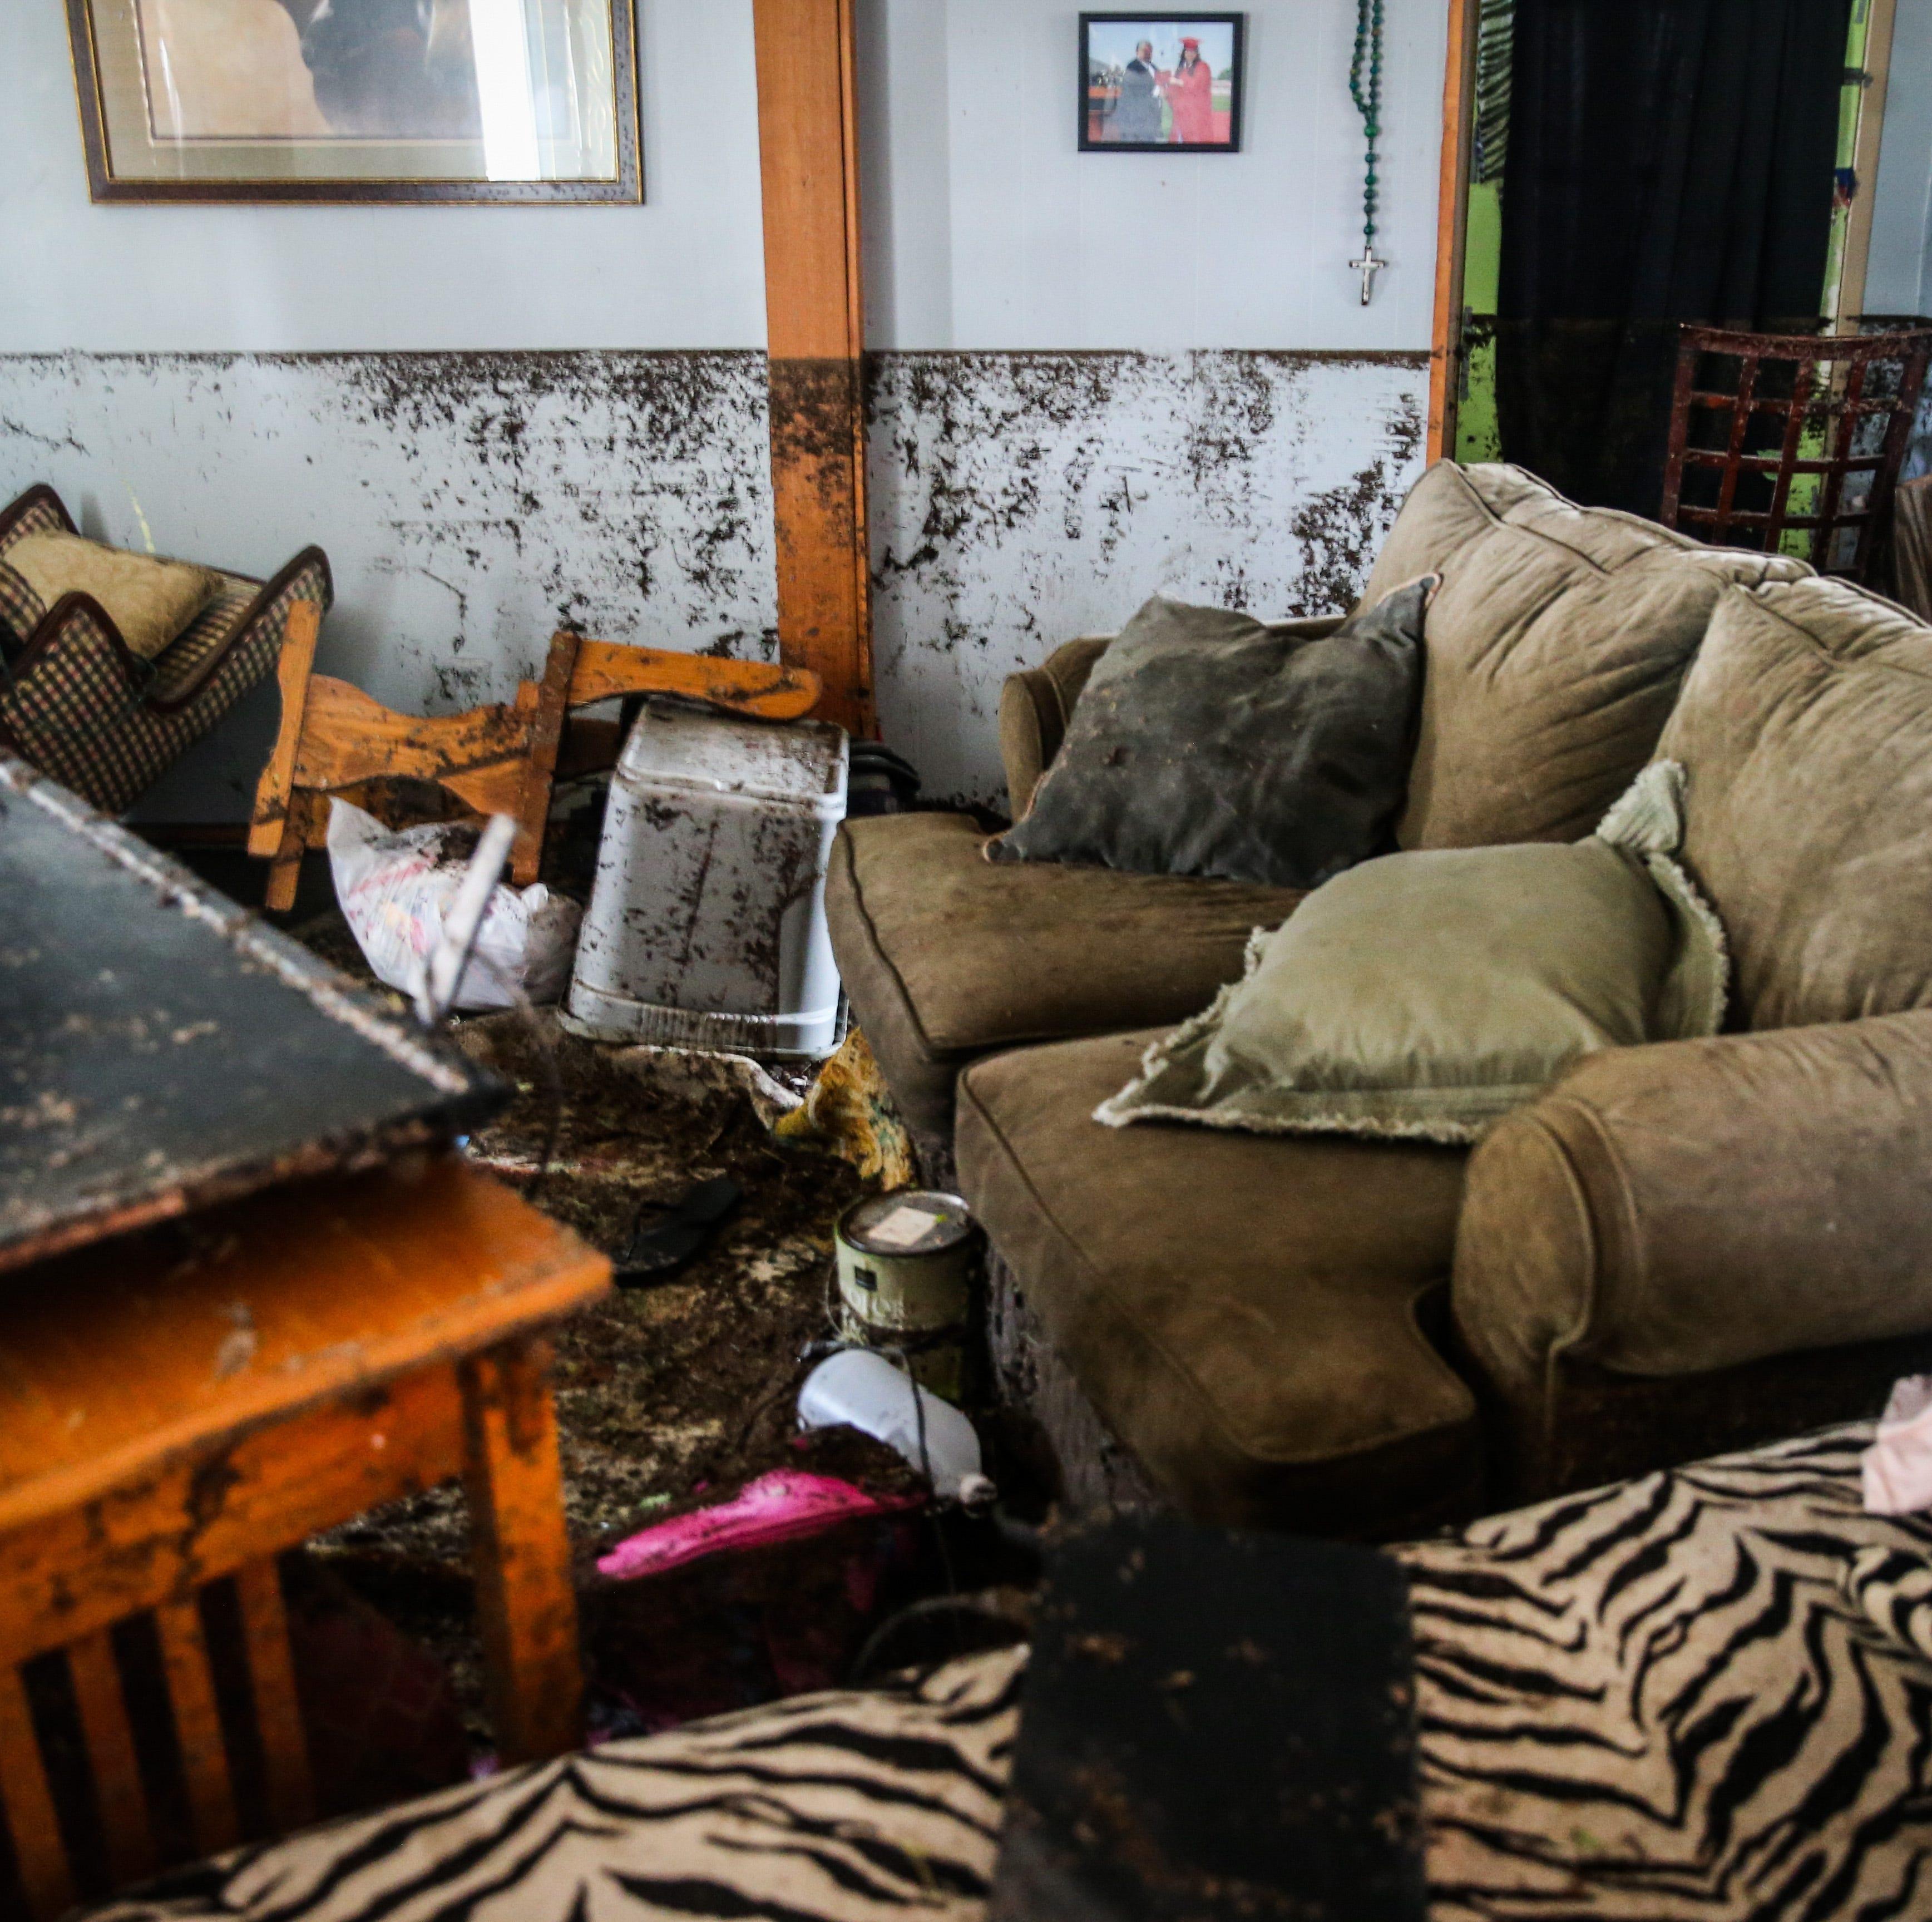 Sonora residents organizing to rebuild after devastating flood